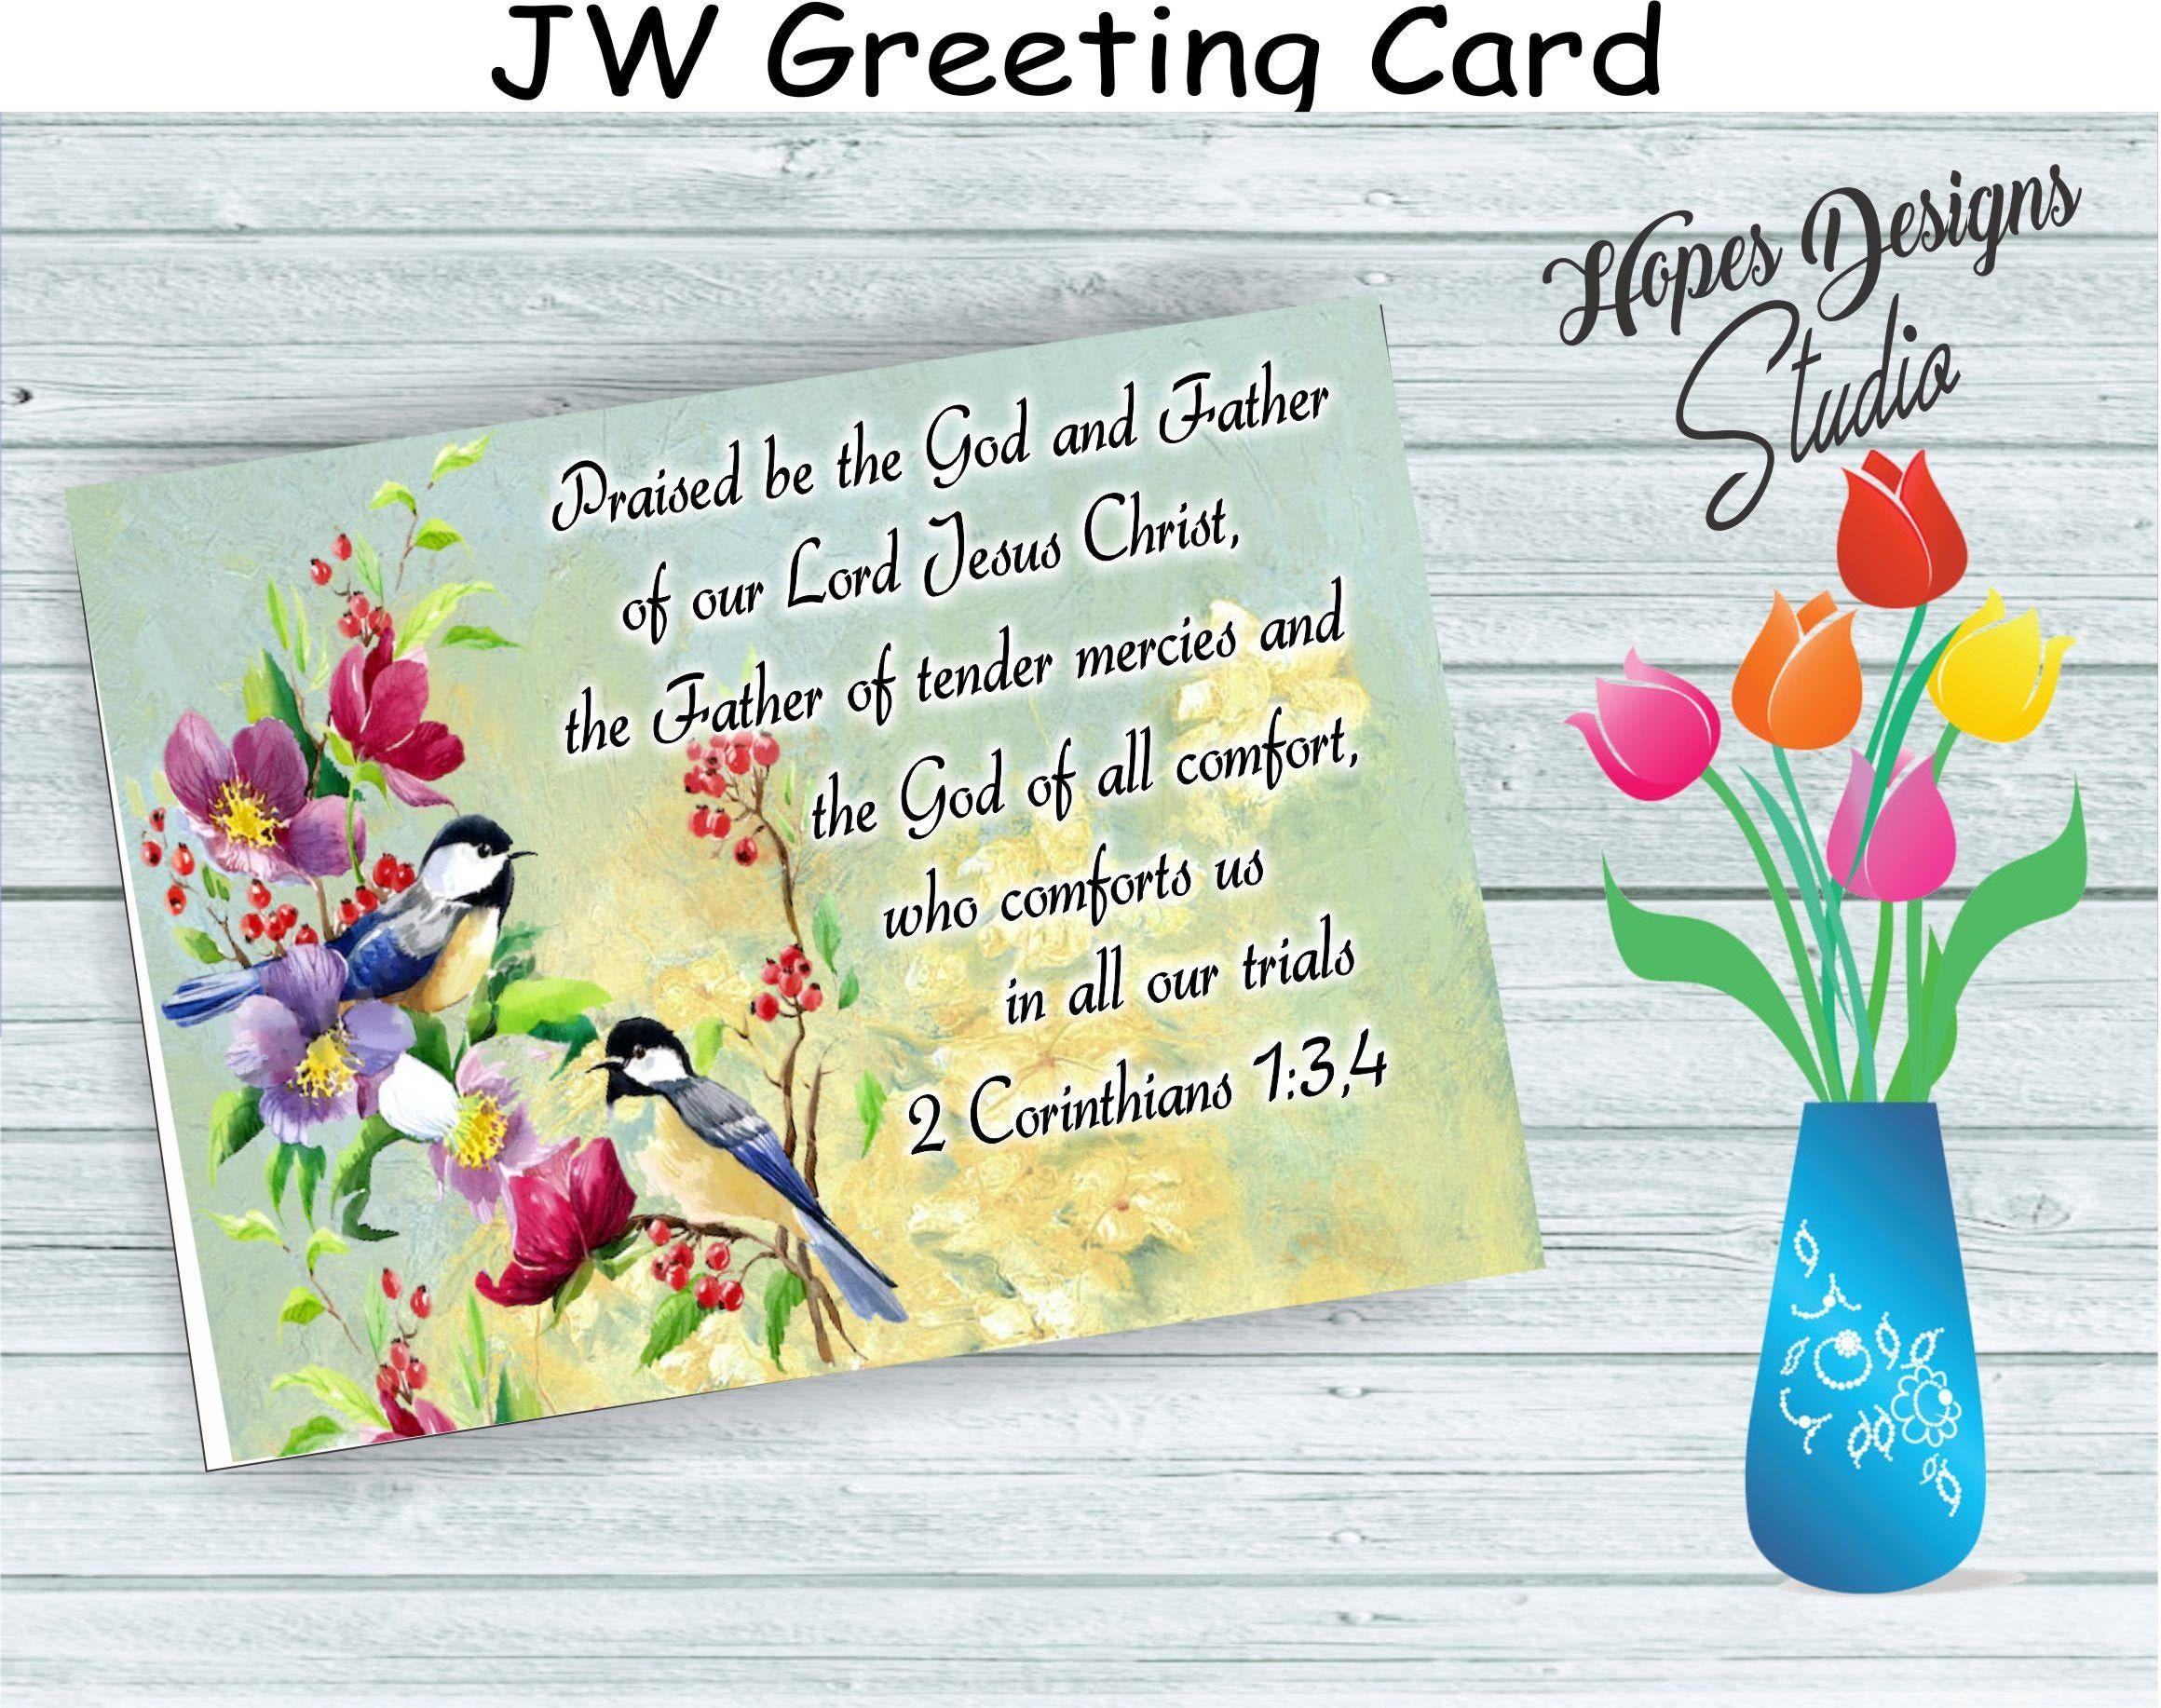 Jw Gifts Jw Greeting Card Praised Be The God Of All Etsy In 2021 Jw Gifts Cards Greeting Cards